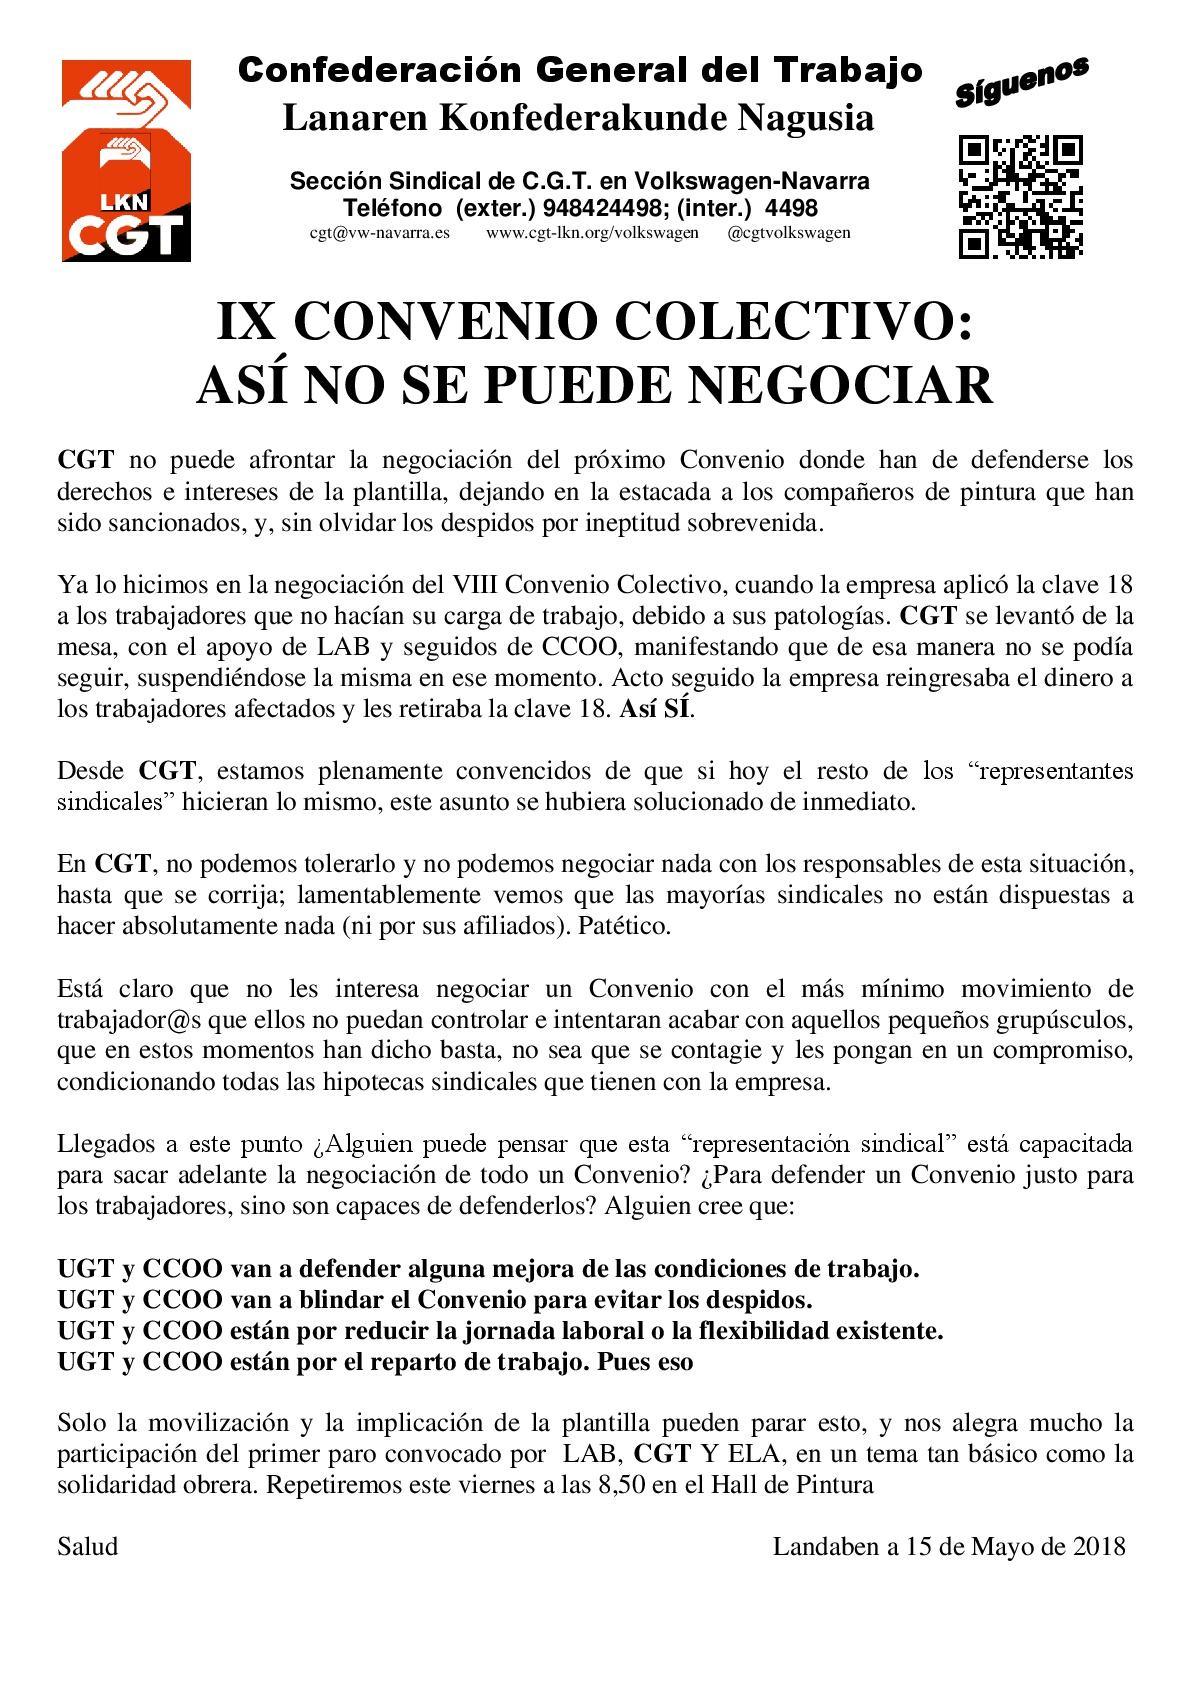 IX CONVENIO COLECTIVO-001